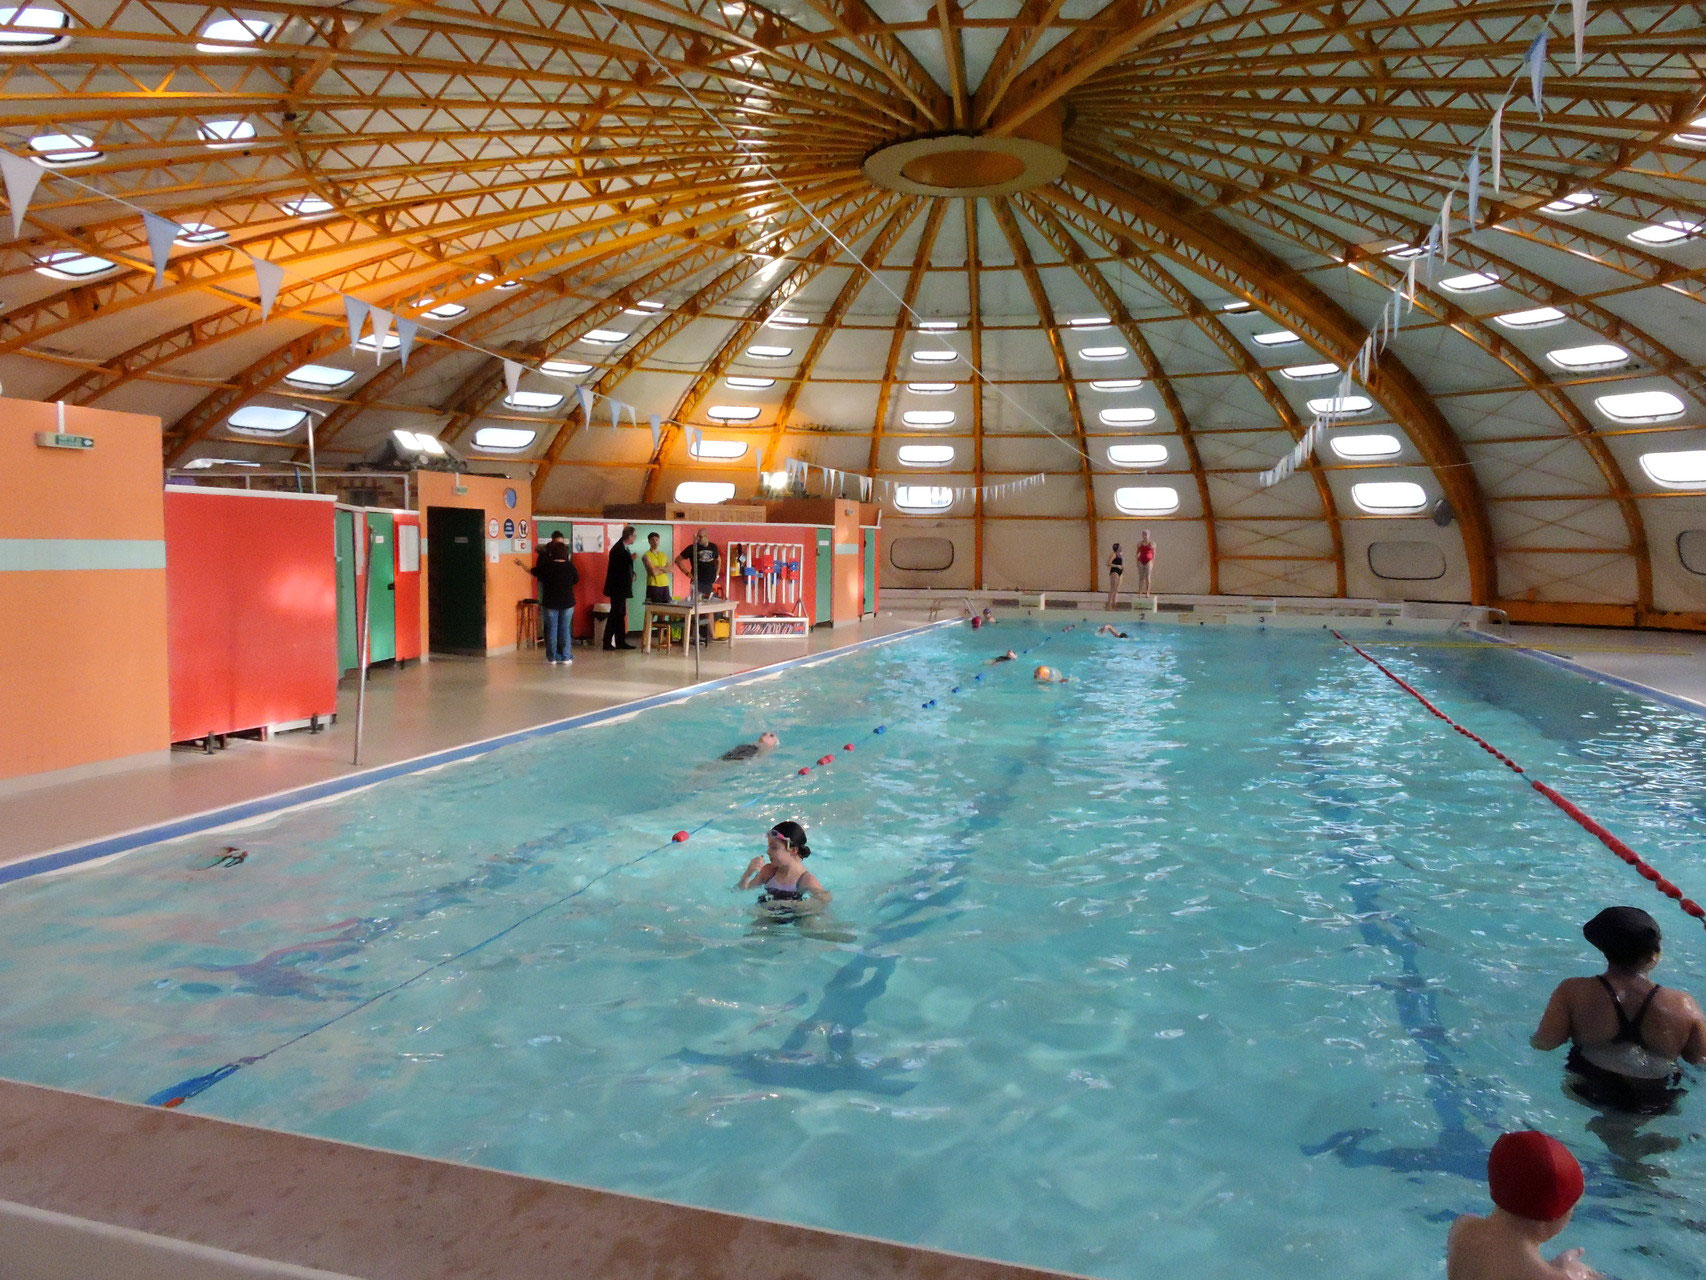 Horaires site de aquabikeaniche - Horaire piscine vandoeuvre ...